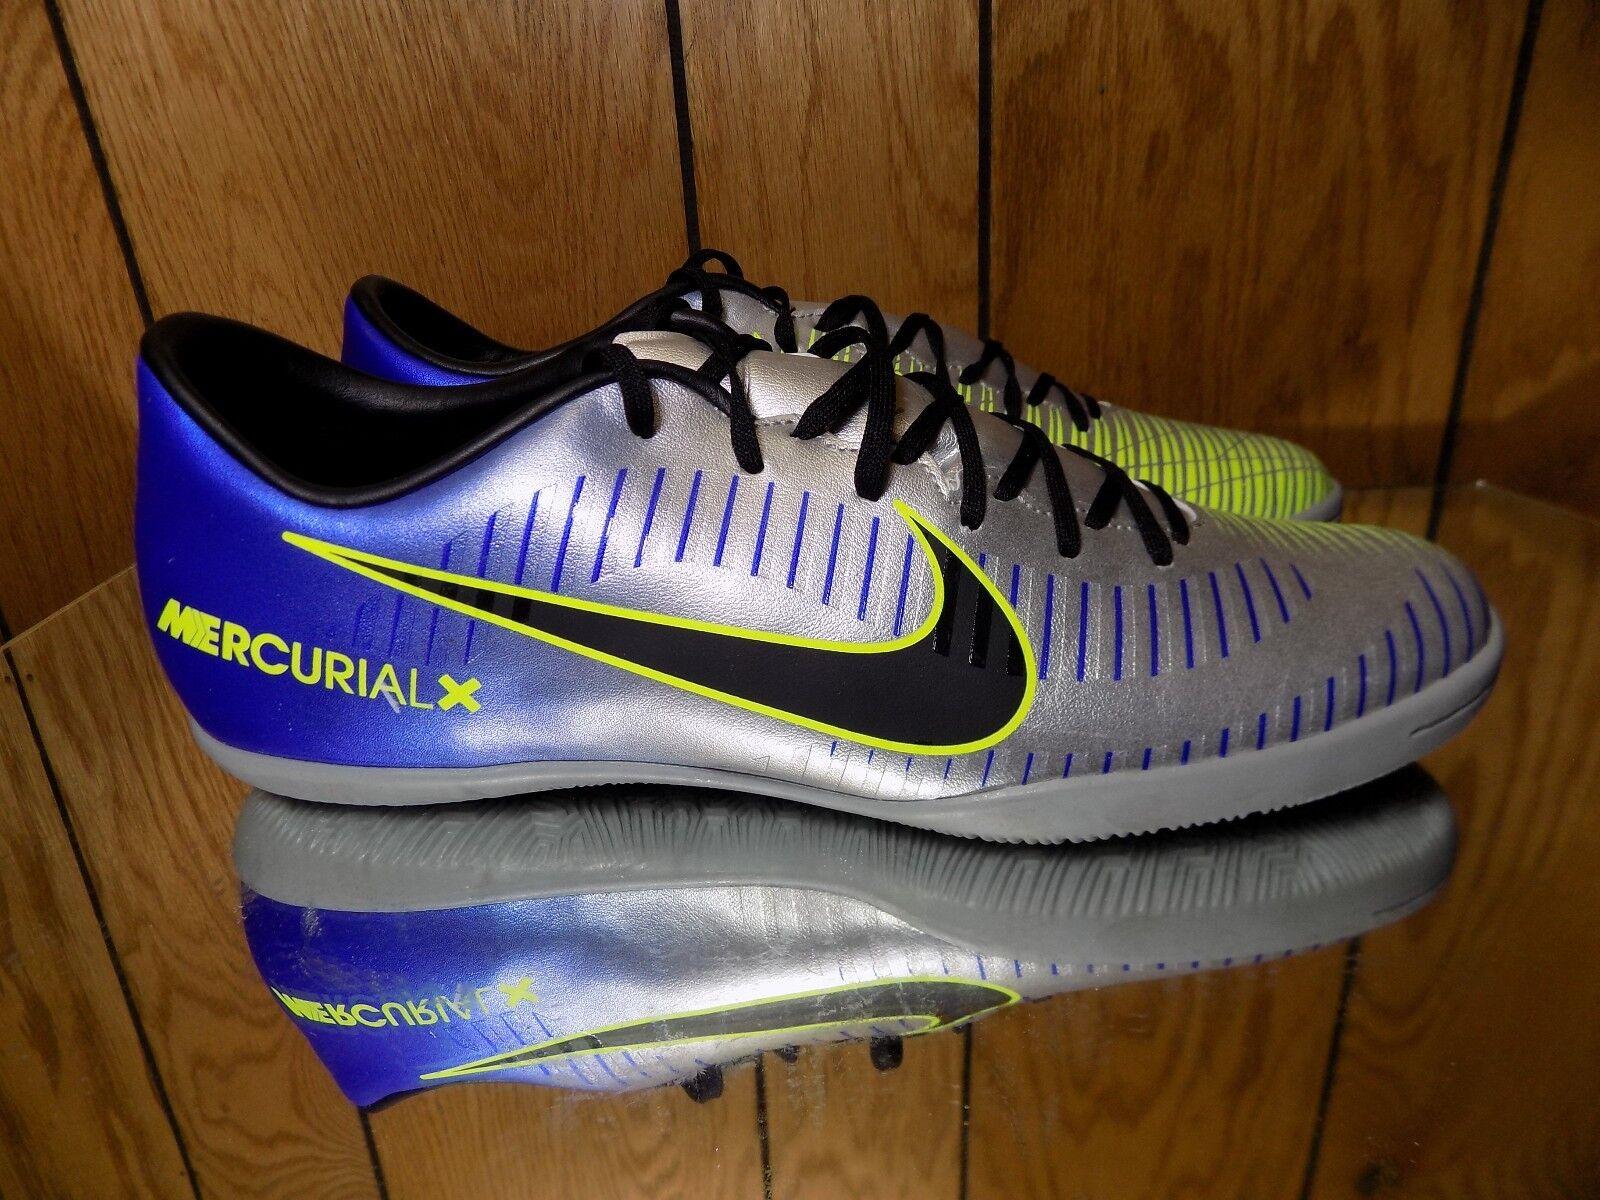 Nike MercurialX Victory 6 NJR IC Men's Indoor Soccer shoes 921516-407 s 9.5